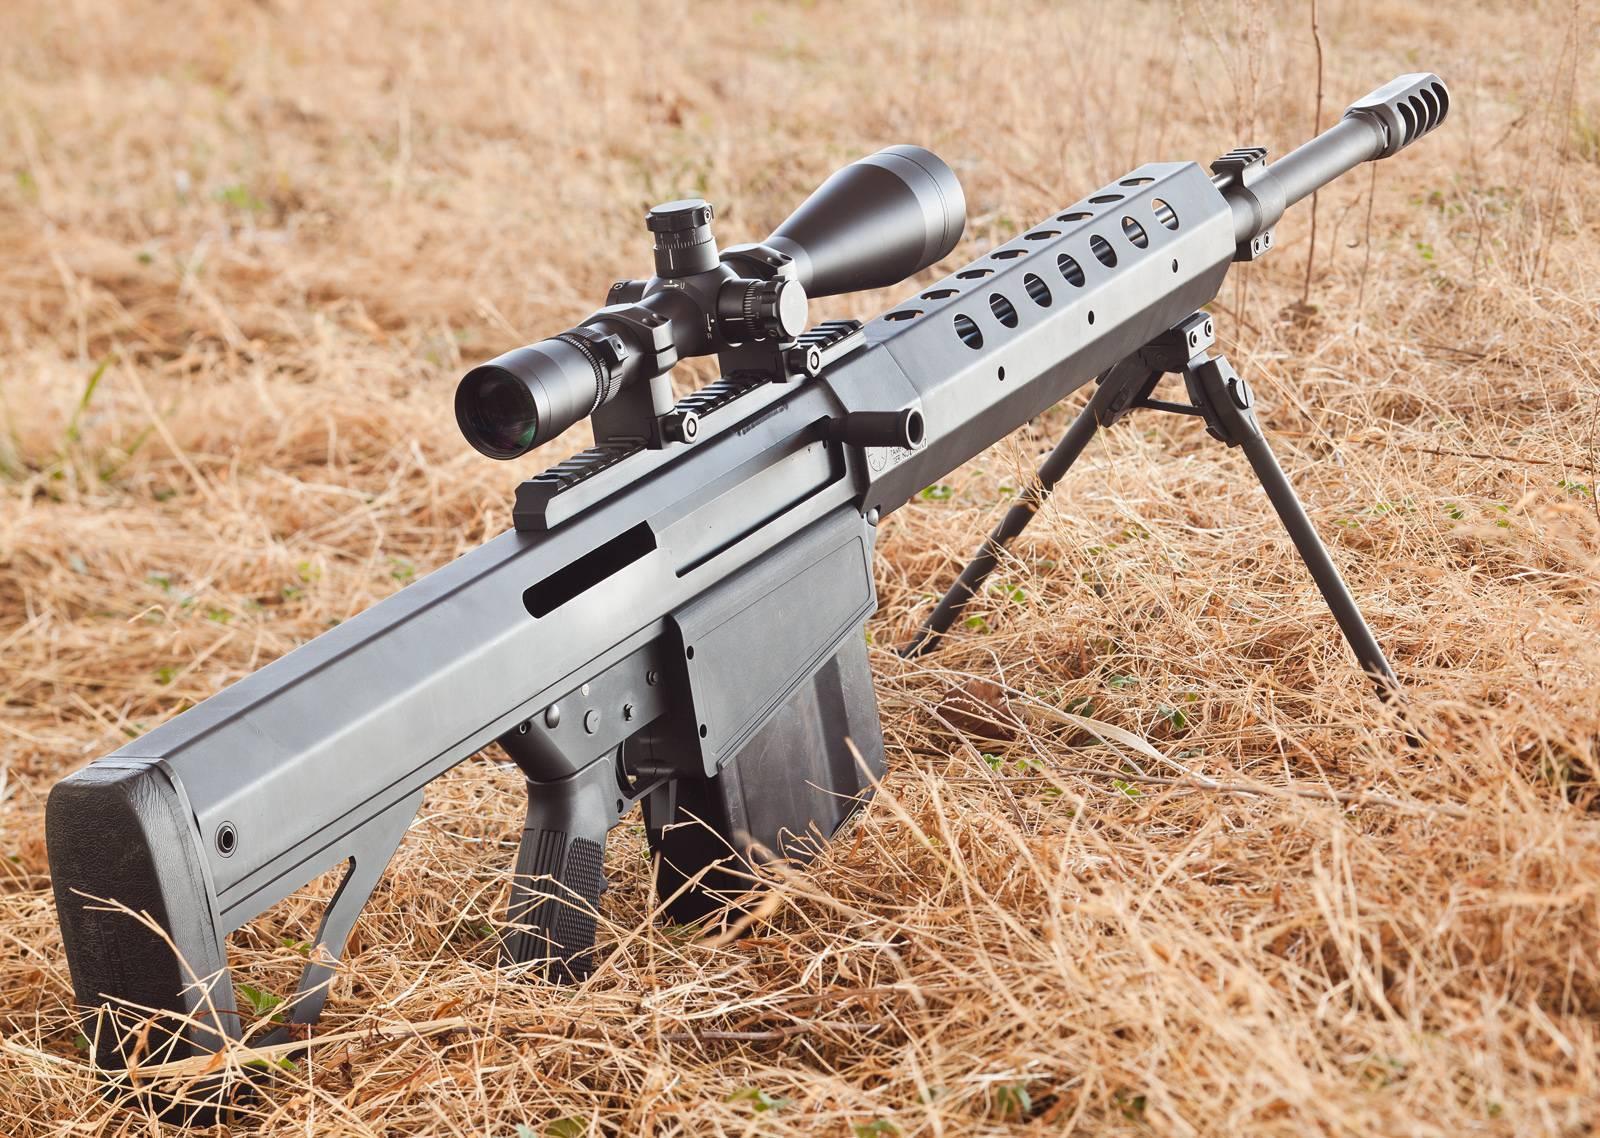 Крупнокалиберная снайперская винтовка serbu rn-50